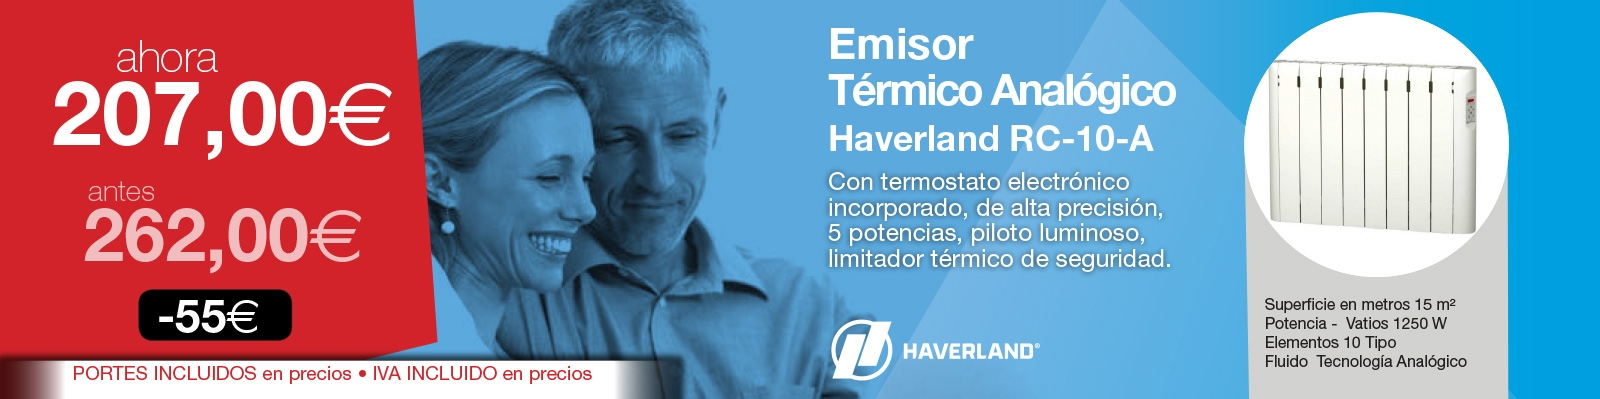 Emisor termico Haverland RC-10A